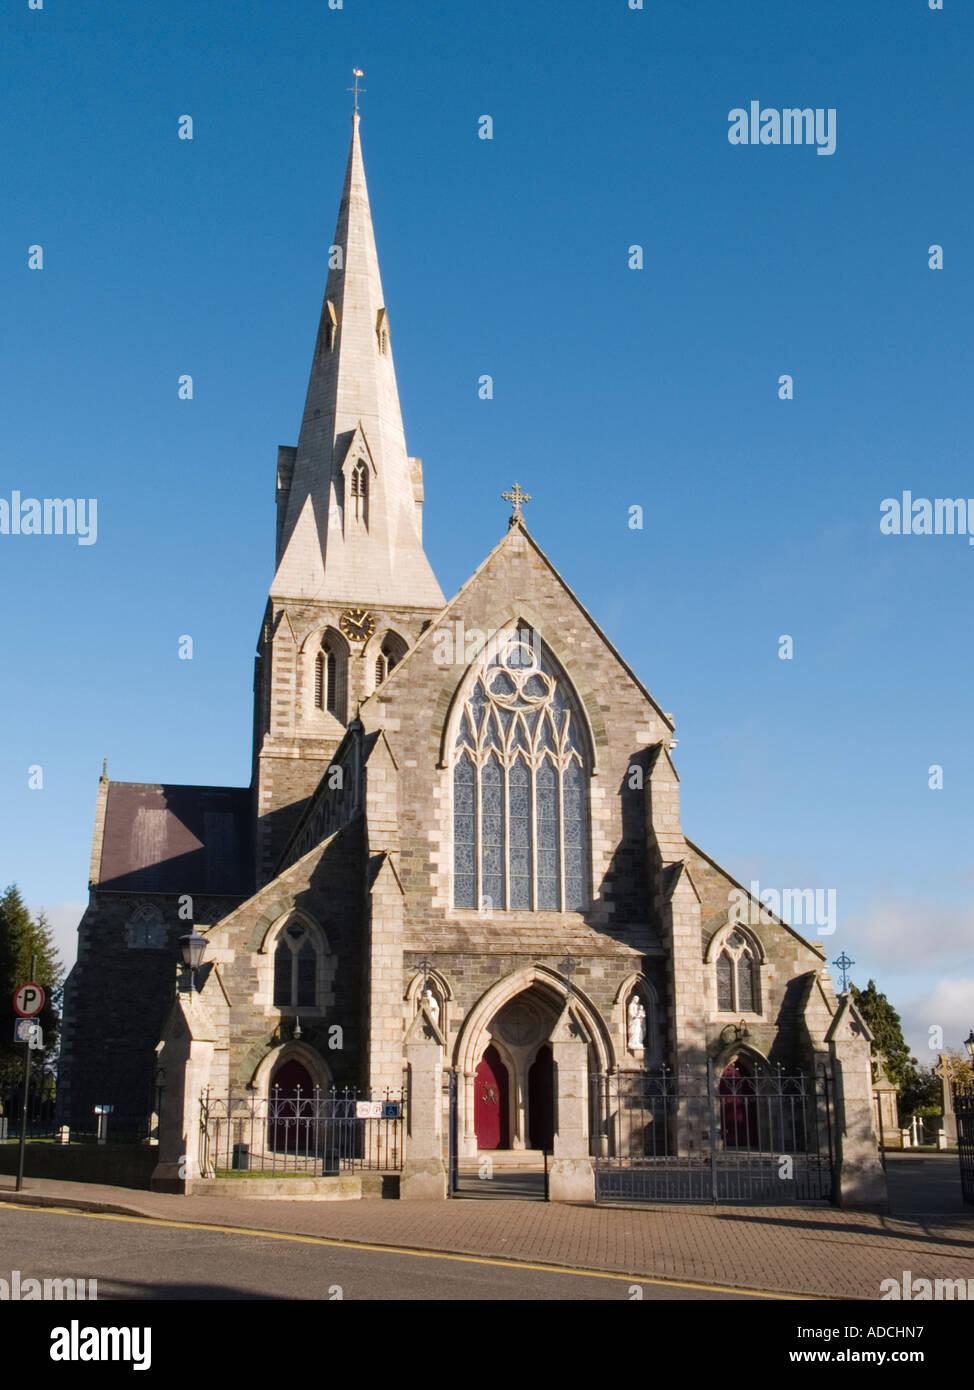 ST AIDAN'S CATHEDRAL CHURCH 1843 Built by A W N Pugin. Enniscorthy 'Co Wexford' Eire - Stock Image